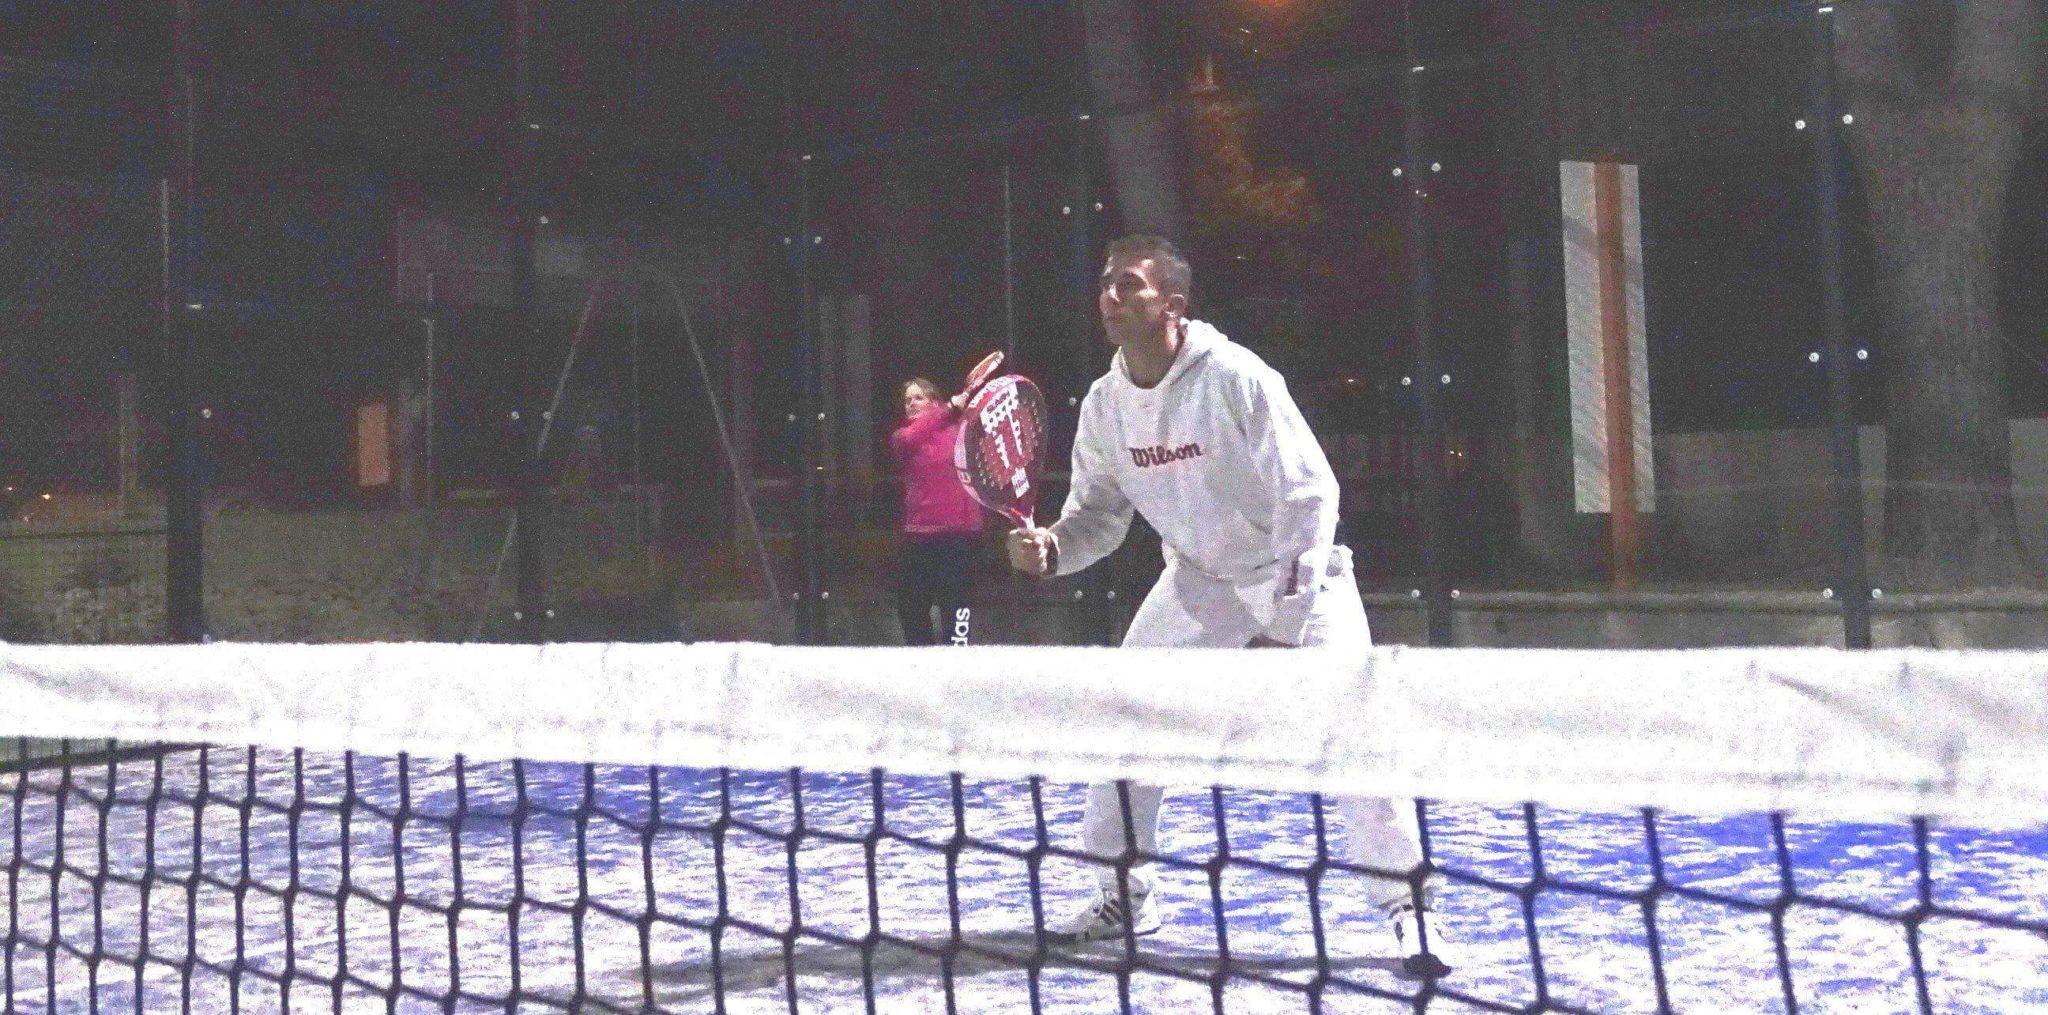 I Nîmes, padel udvikler sig hos Tennis Club Forever Nîmes - Padel